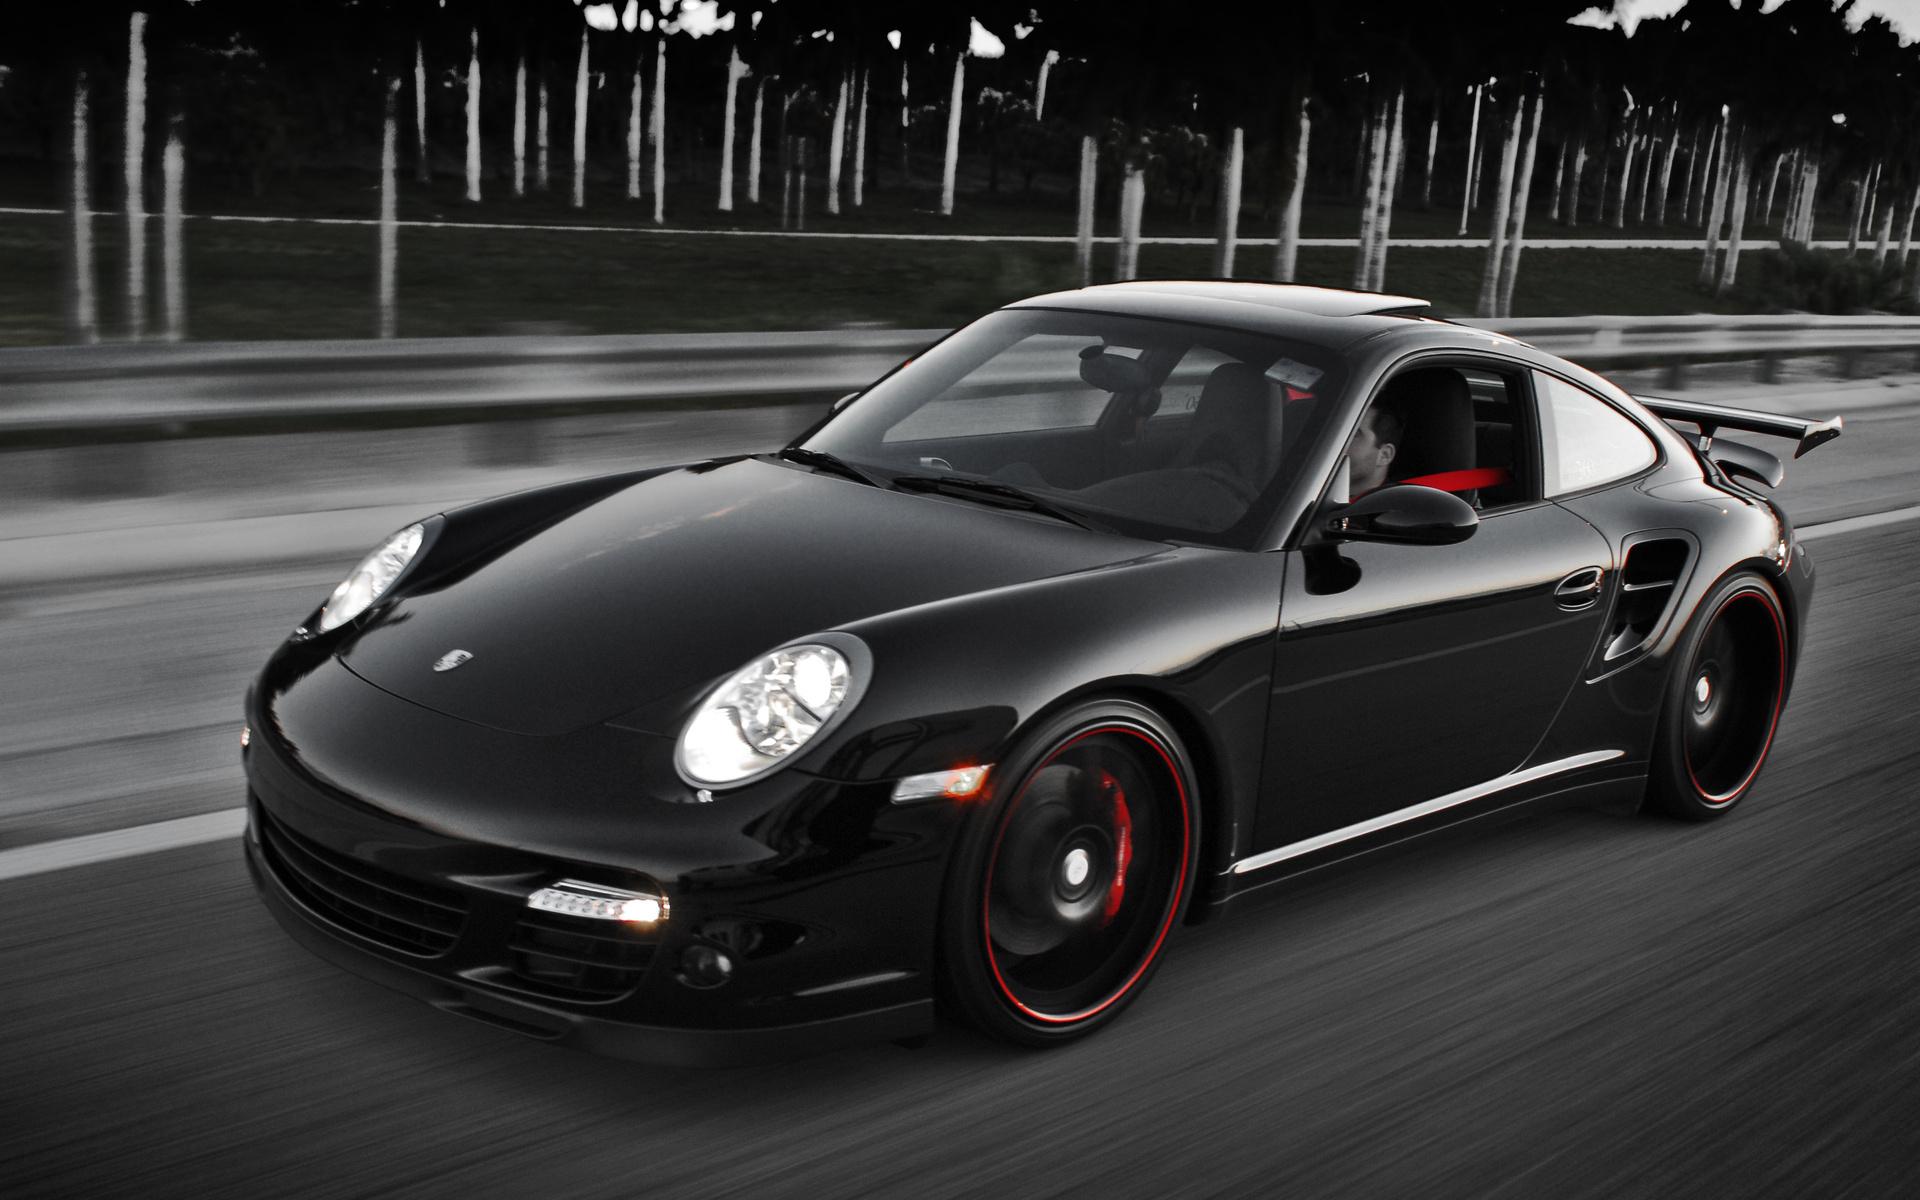 Porsche Desktop Wallpaper - WallpaperSafari